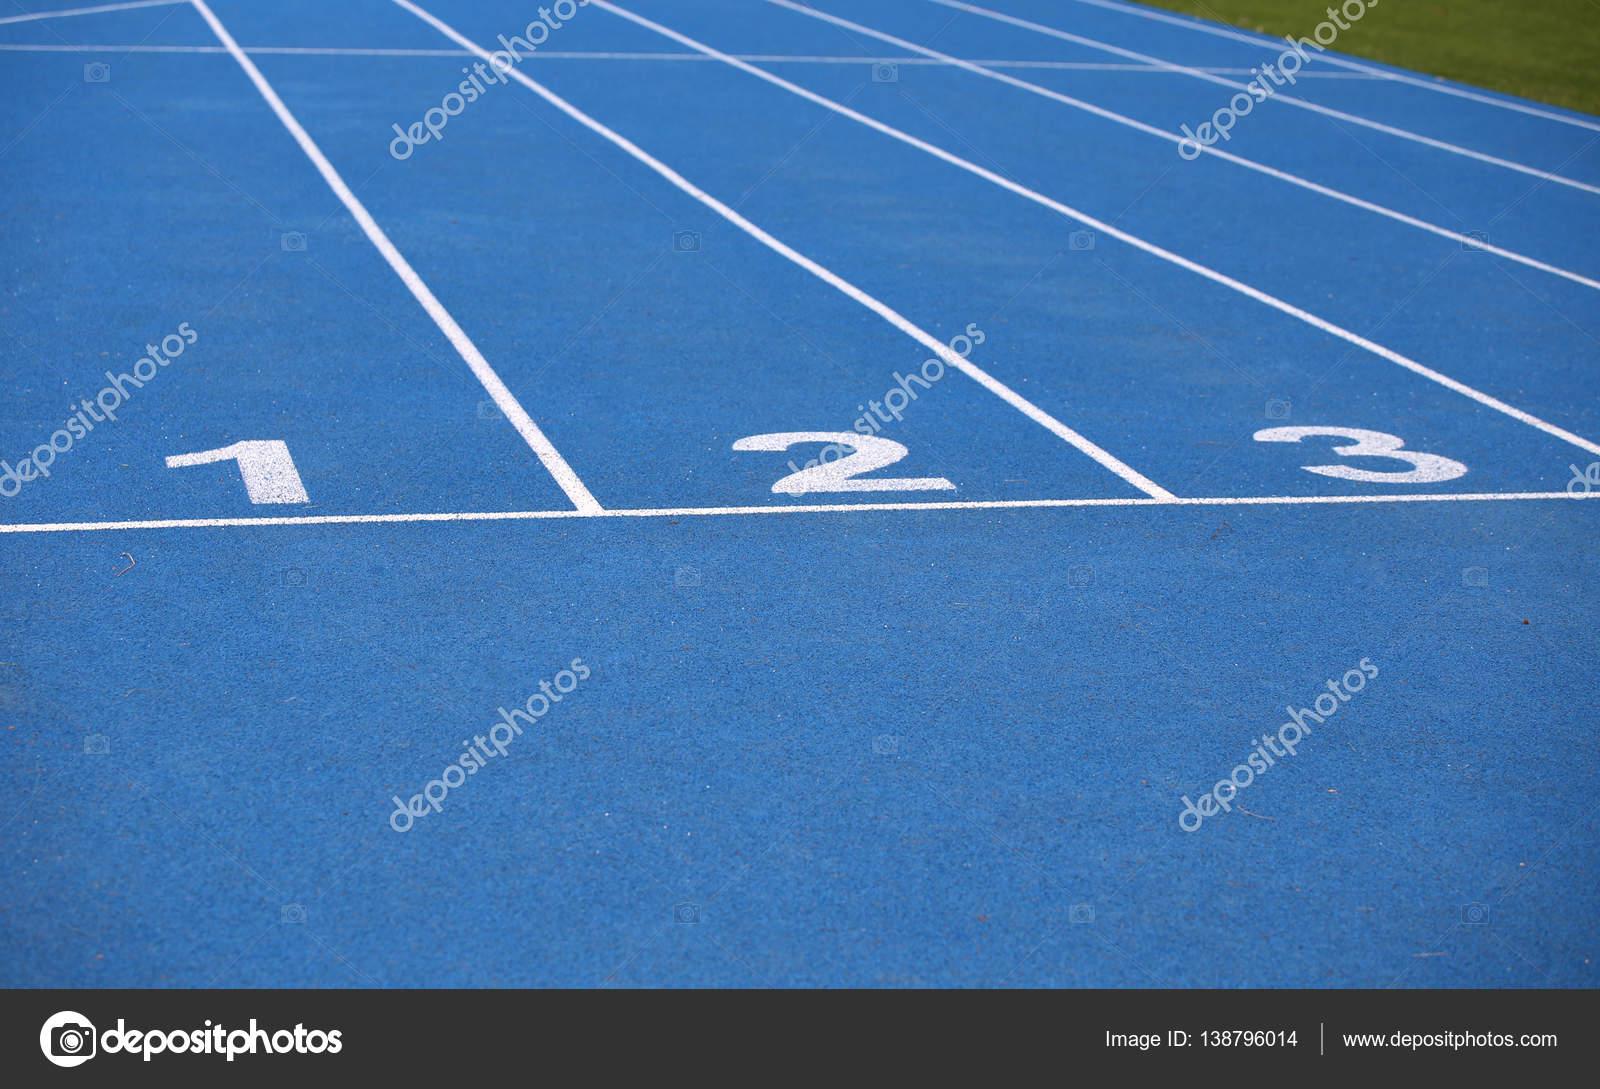 Blue track lanes